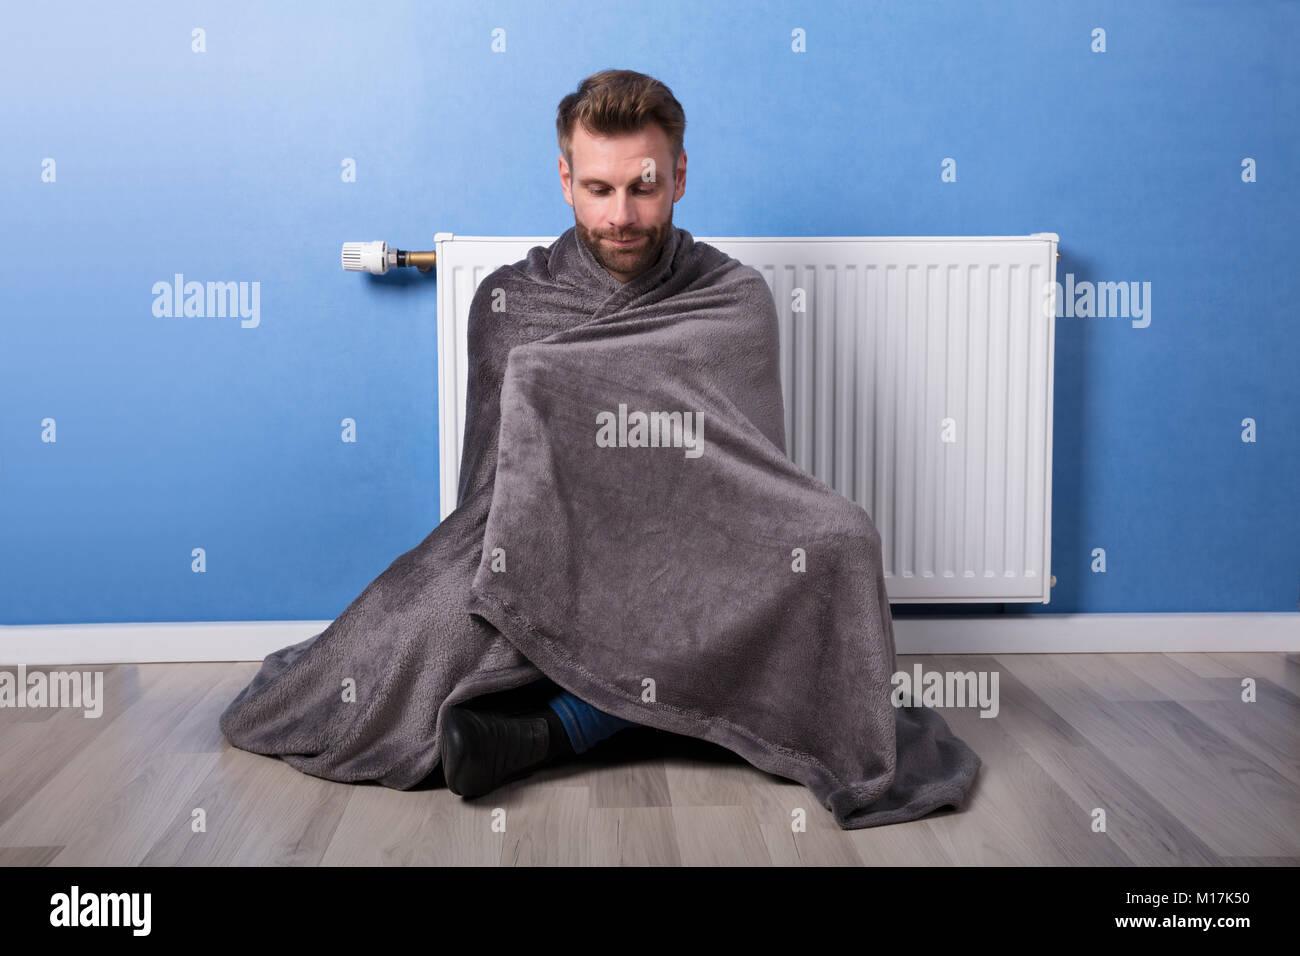 Heating Blanket Stockfotos & Heating Blanket Bilder - Alamy